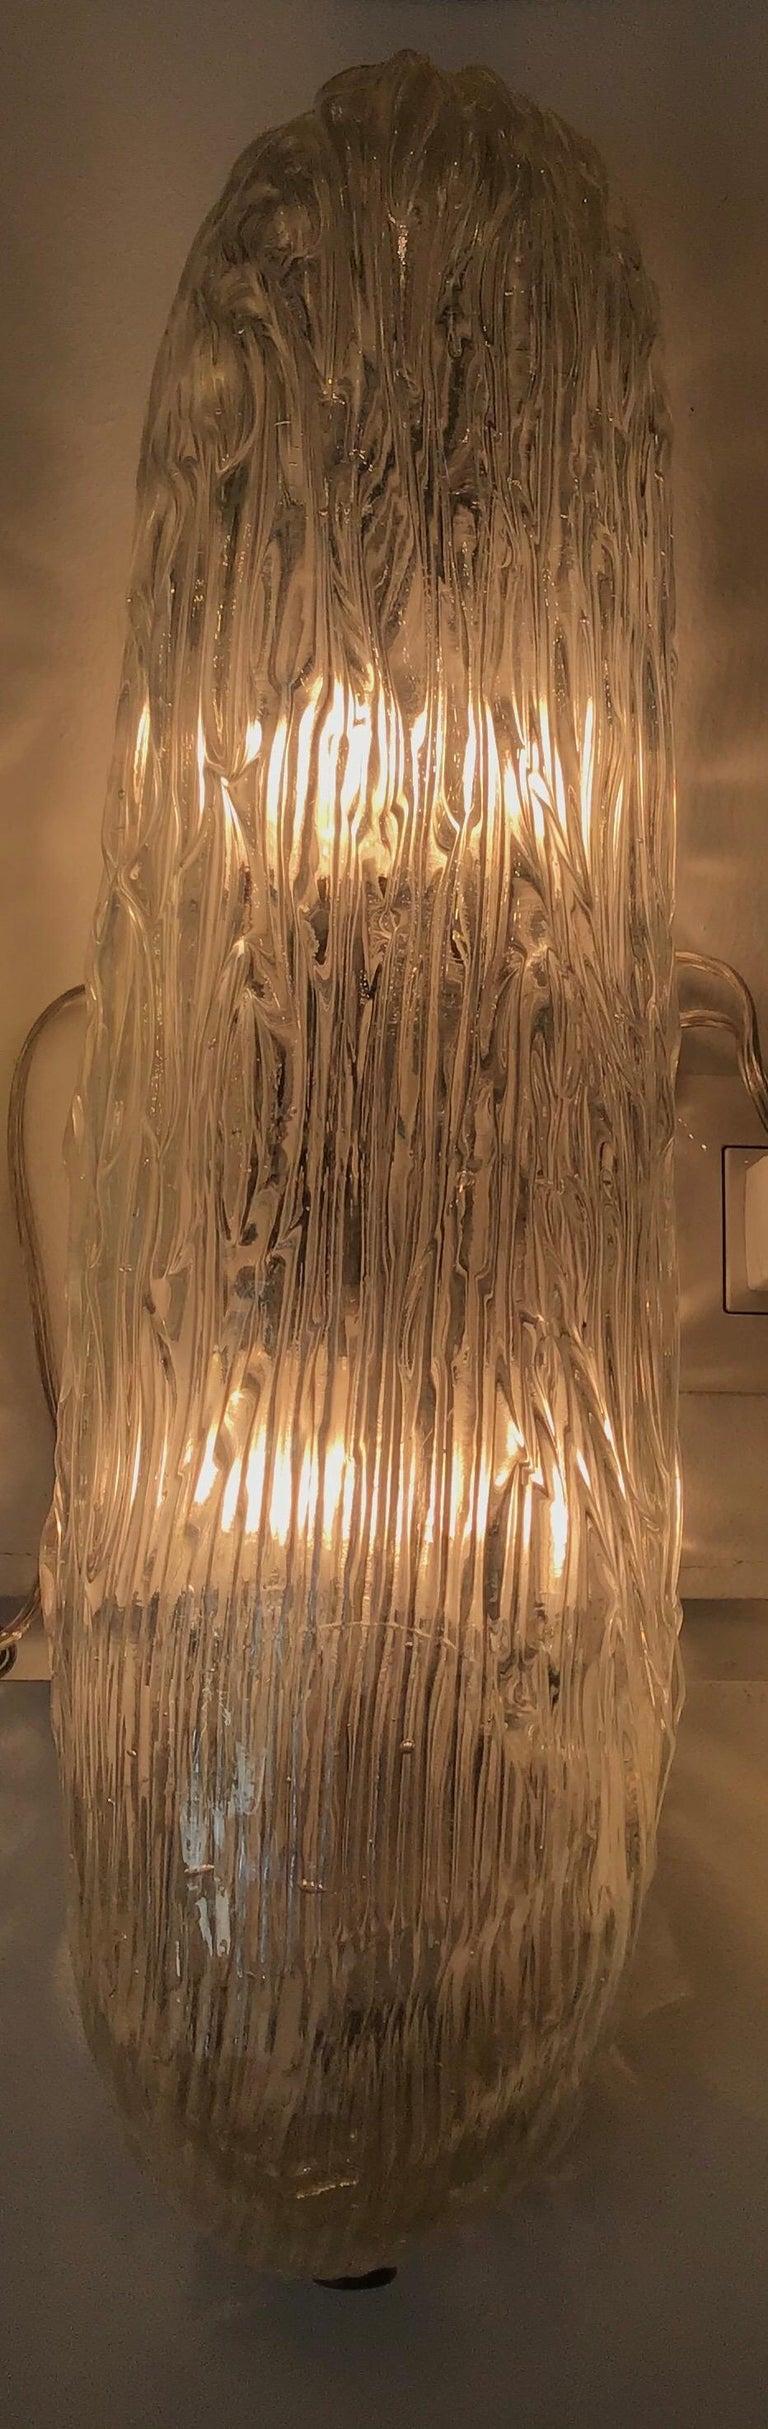 Venini Sconces/Ceiling Light Murano Glass Brass, 1950, Italy For Sale 8